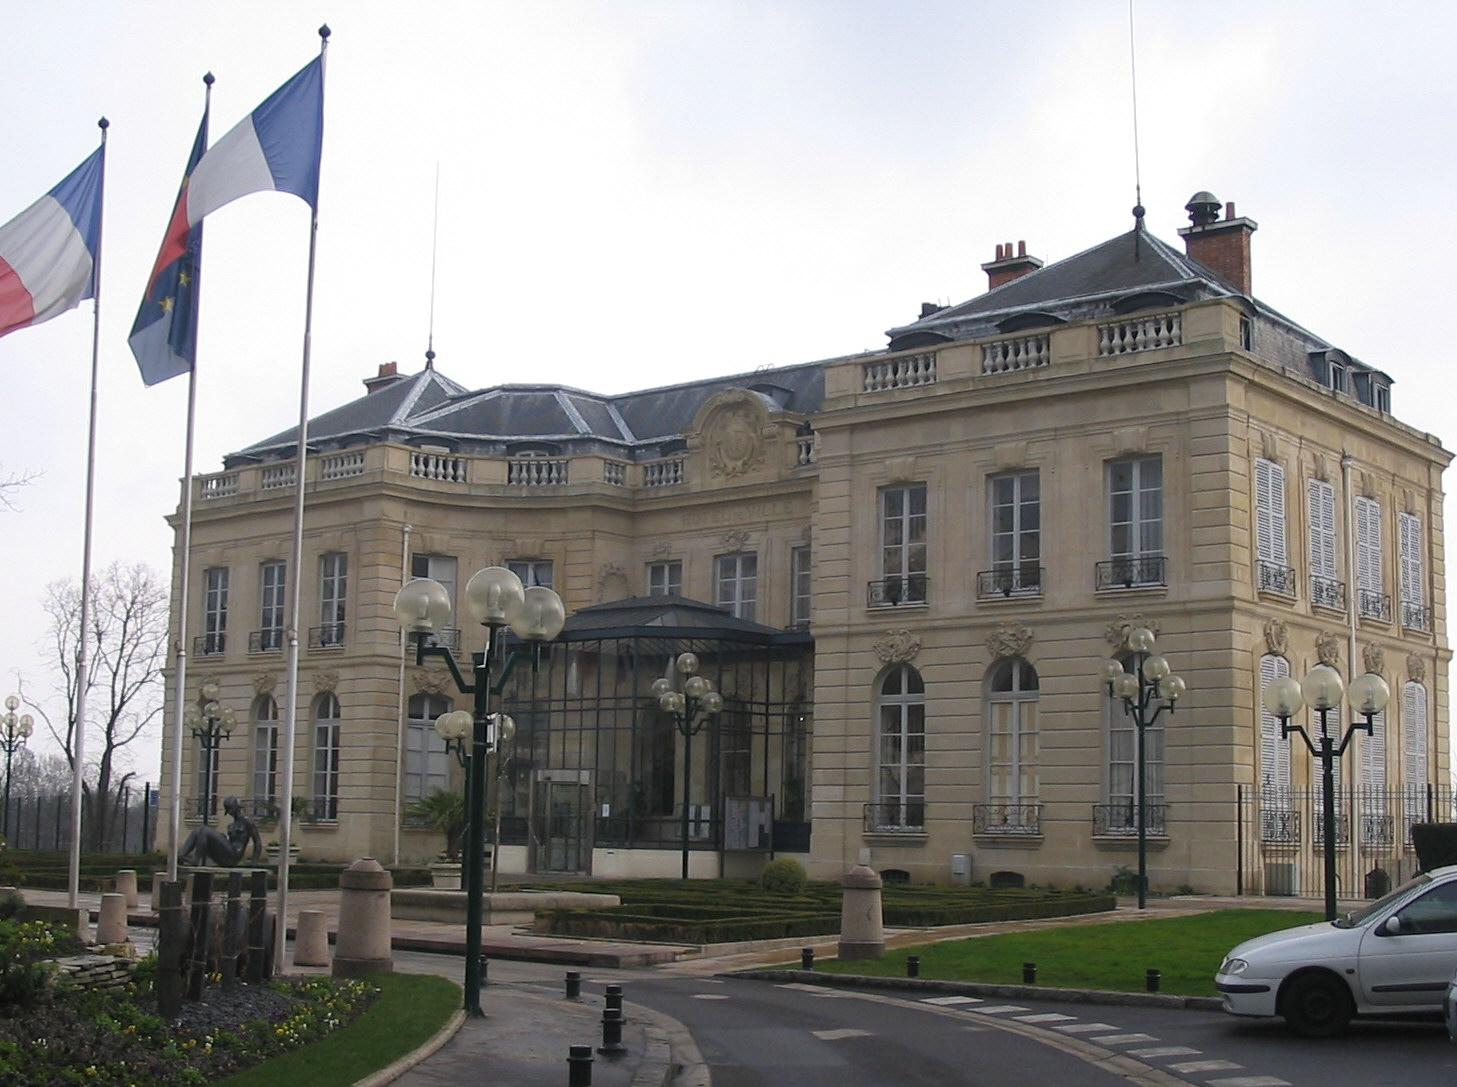 http://fr.academic.ru/pictures/frwiki/77/Mairie_de_%C3%89pinay-sur-Seine.jpg